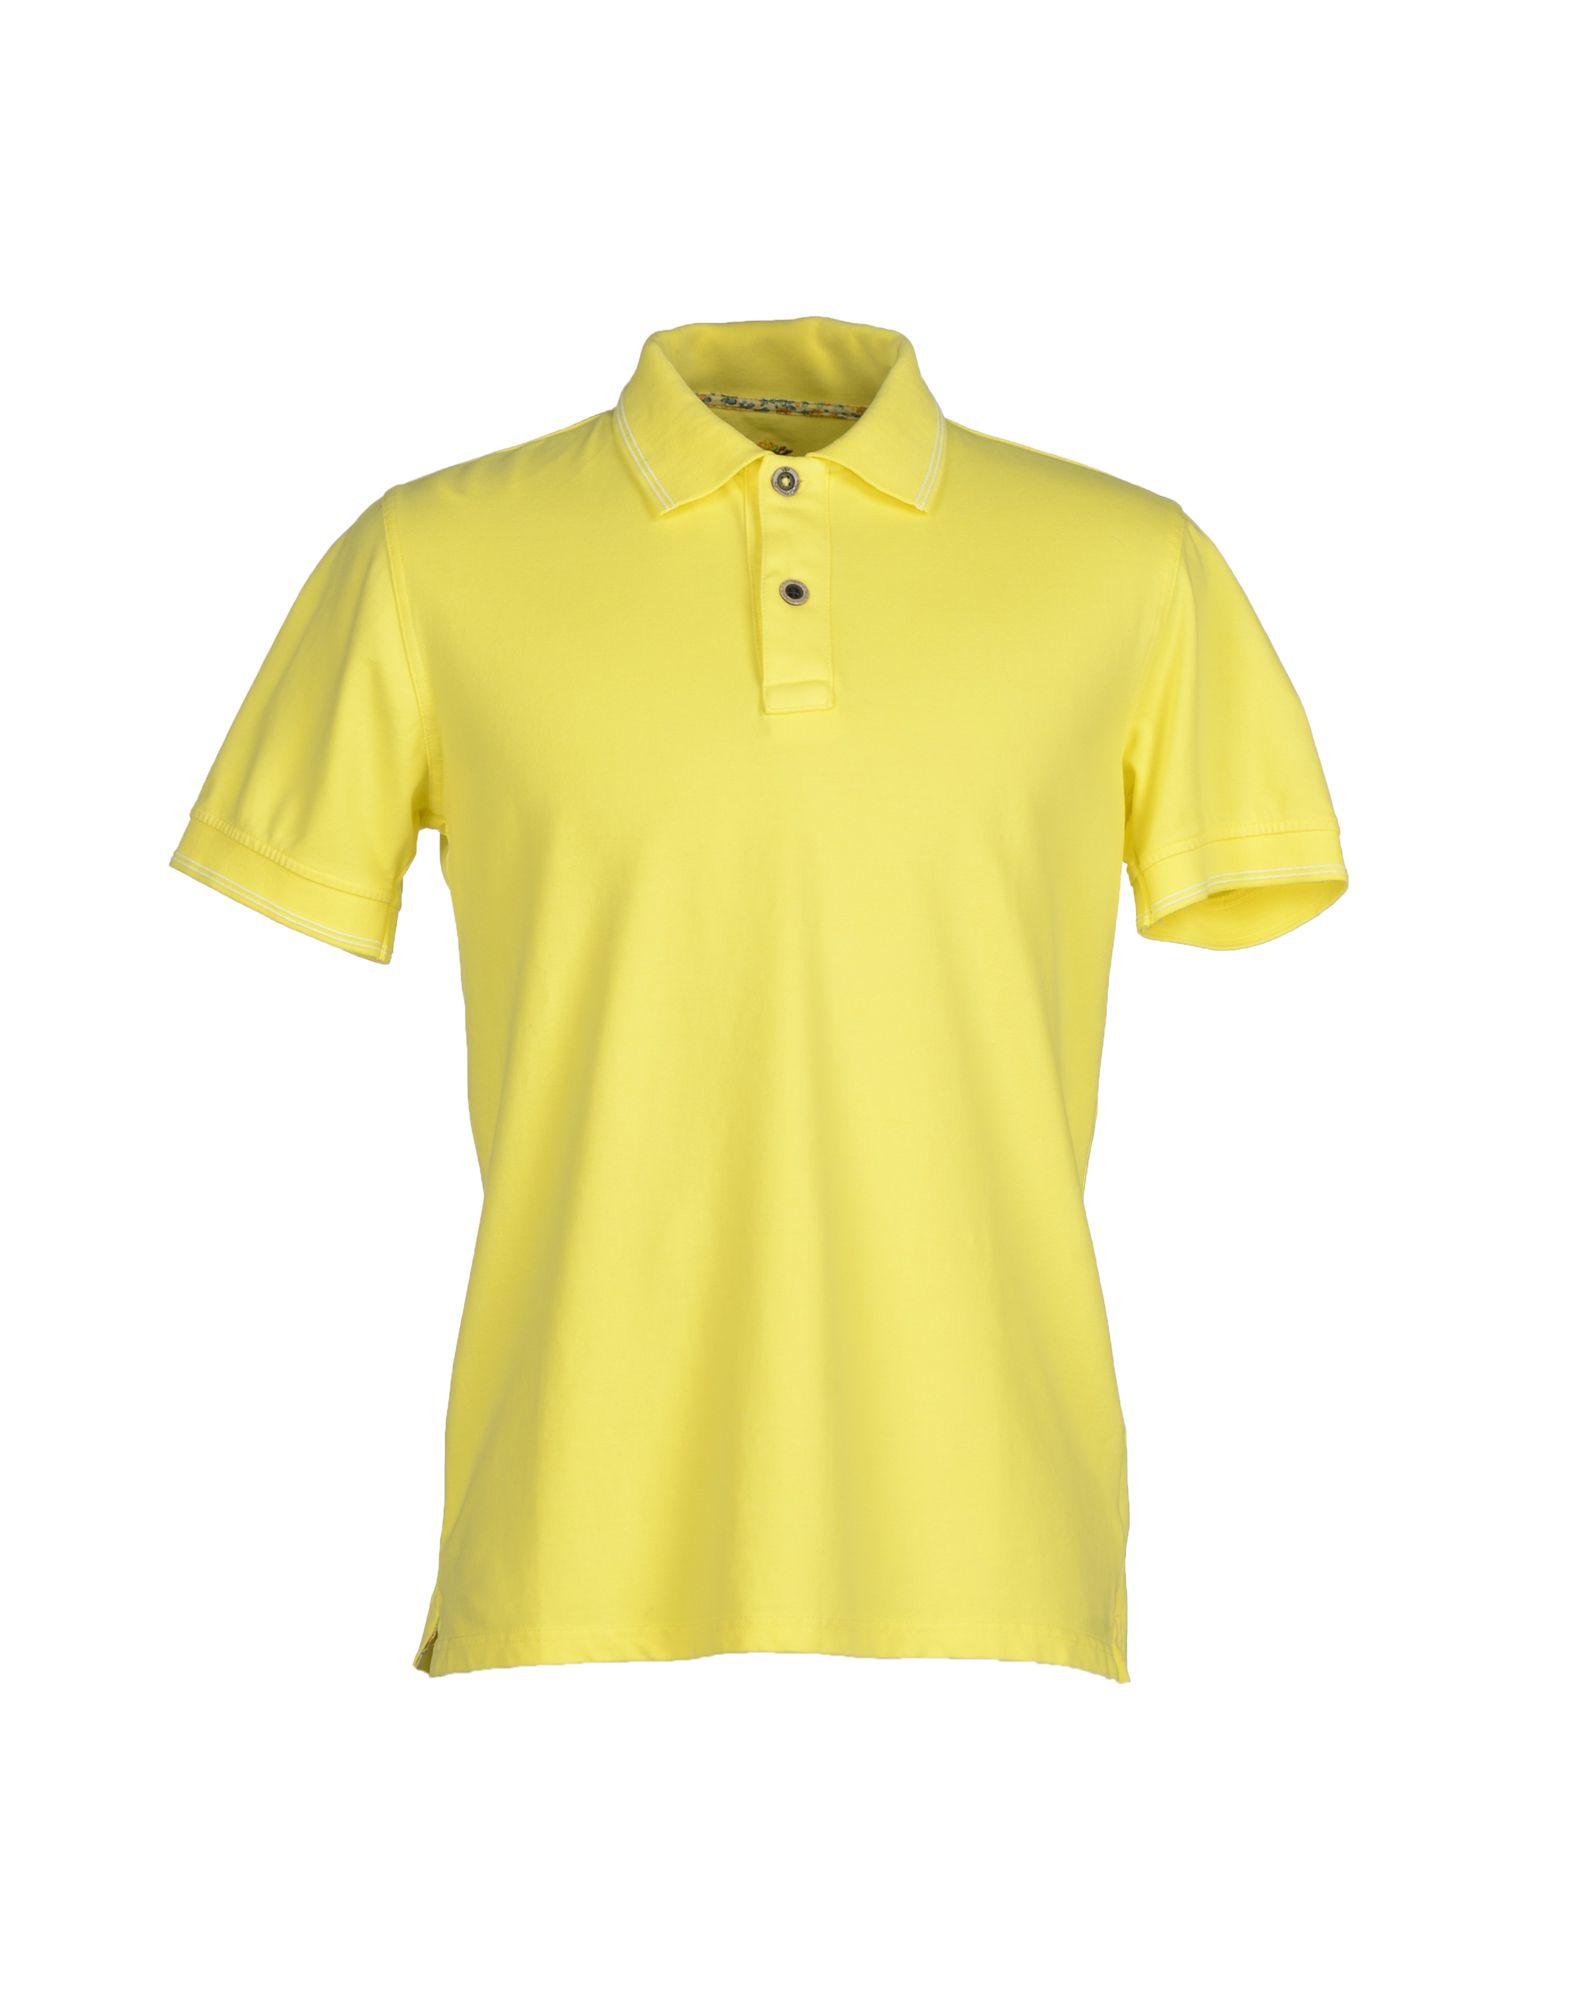 Domenico Tagliente Polo Shirt In Yellow For Men Lyst